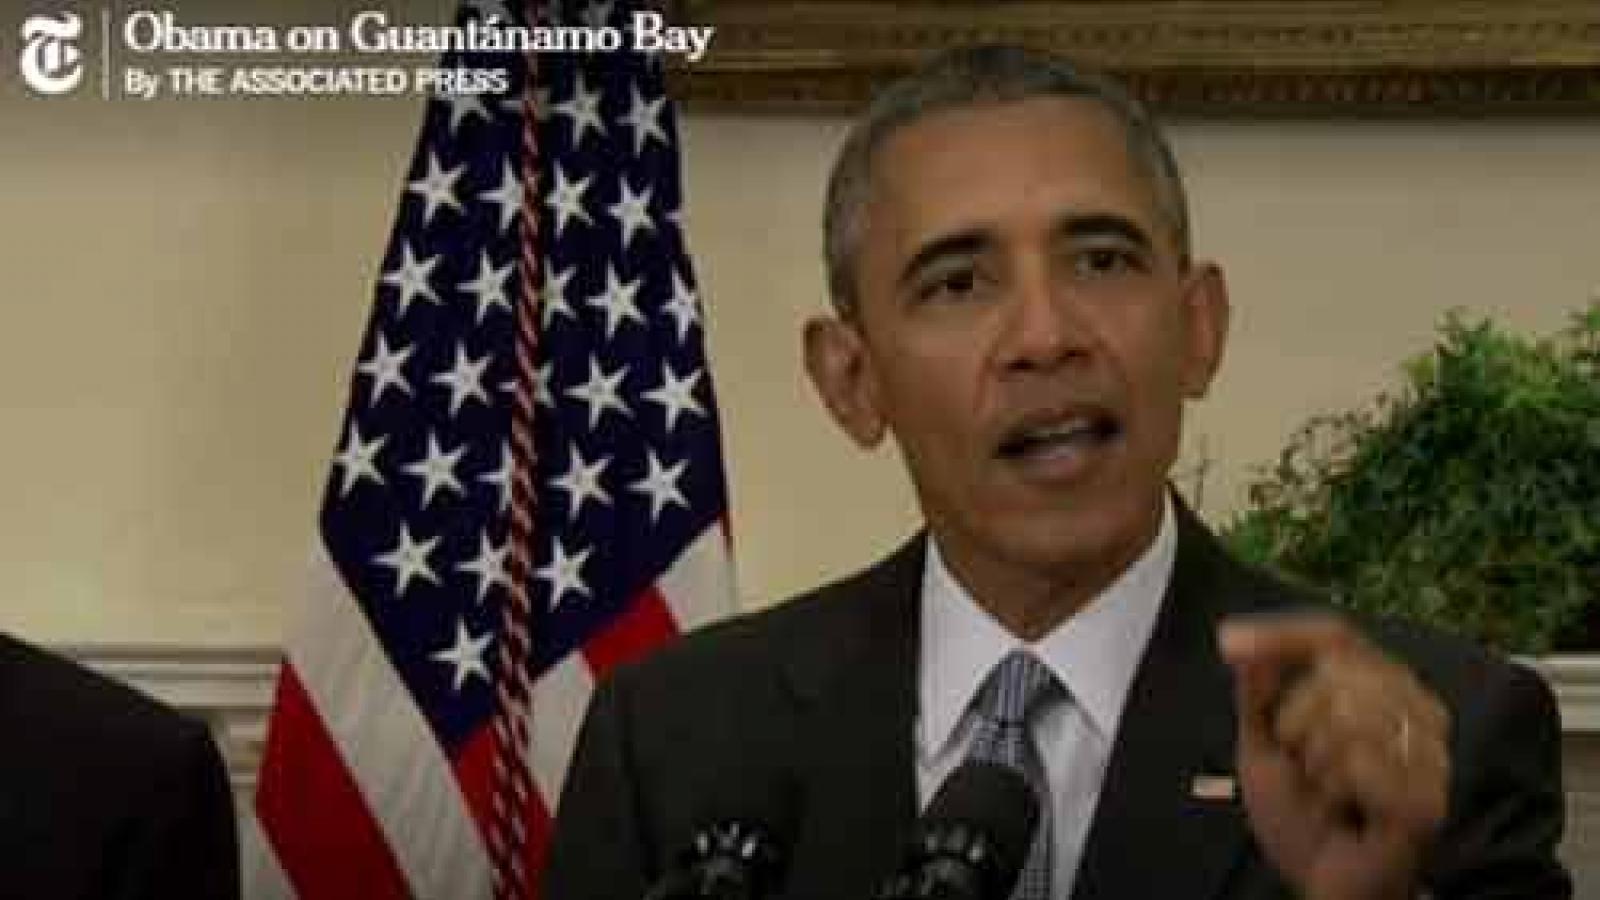 Obama makes last attempt to persuade Congress to close Guantanamo